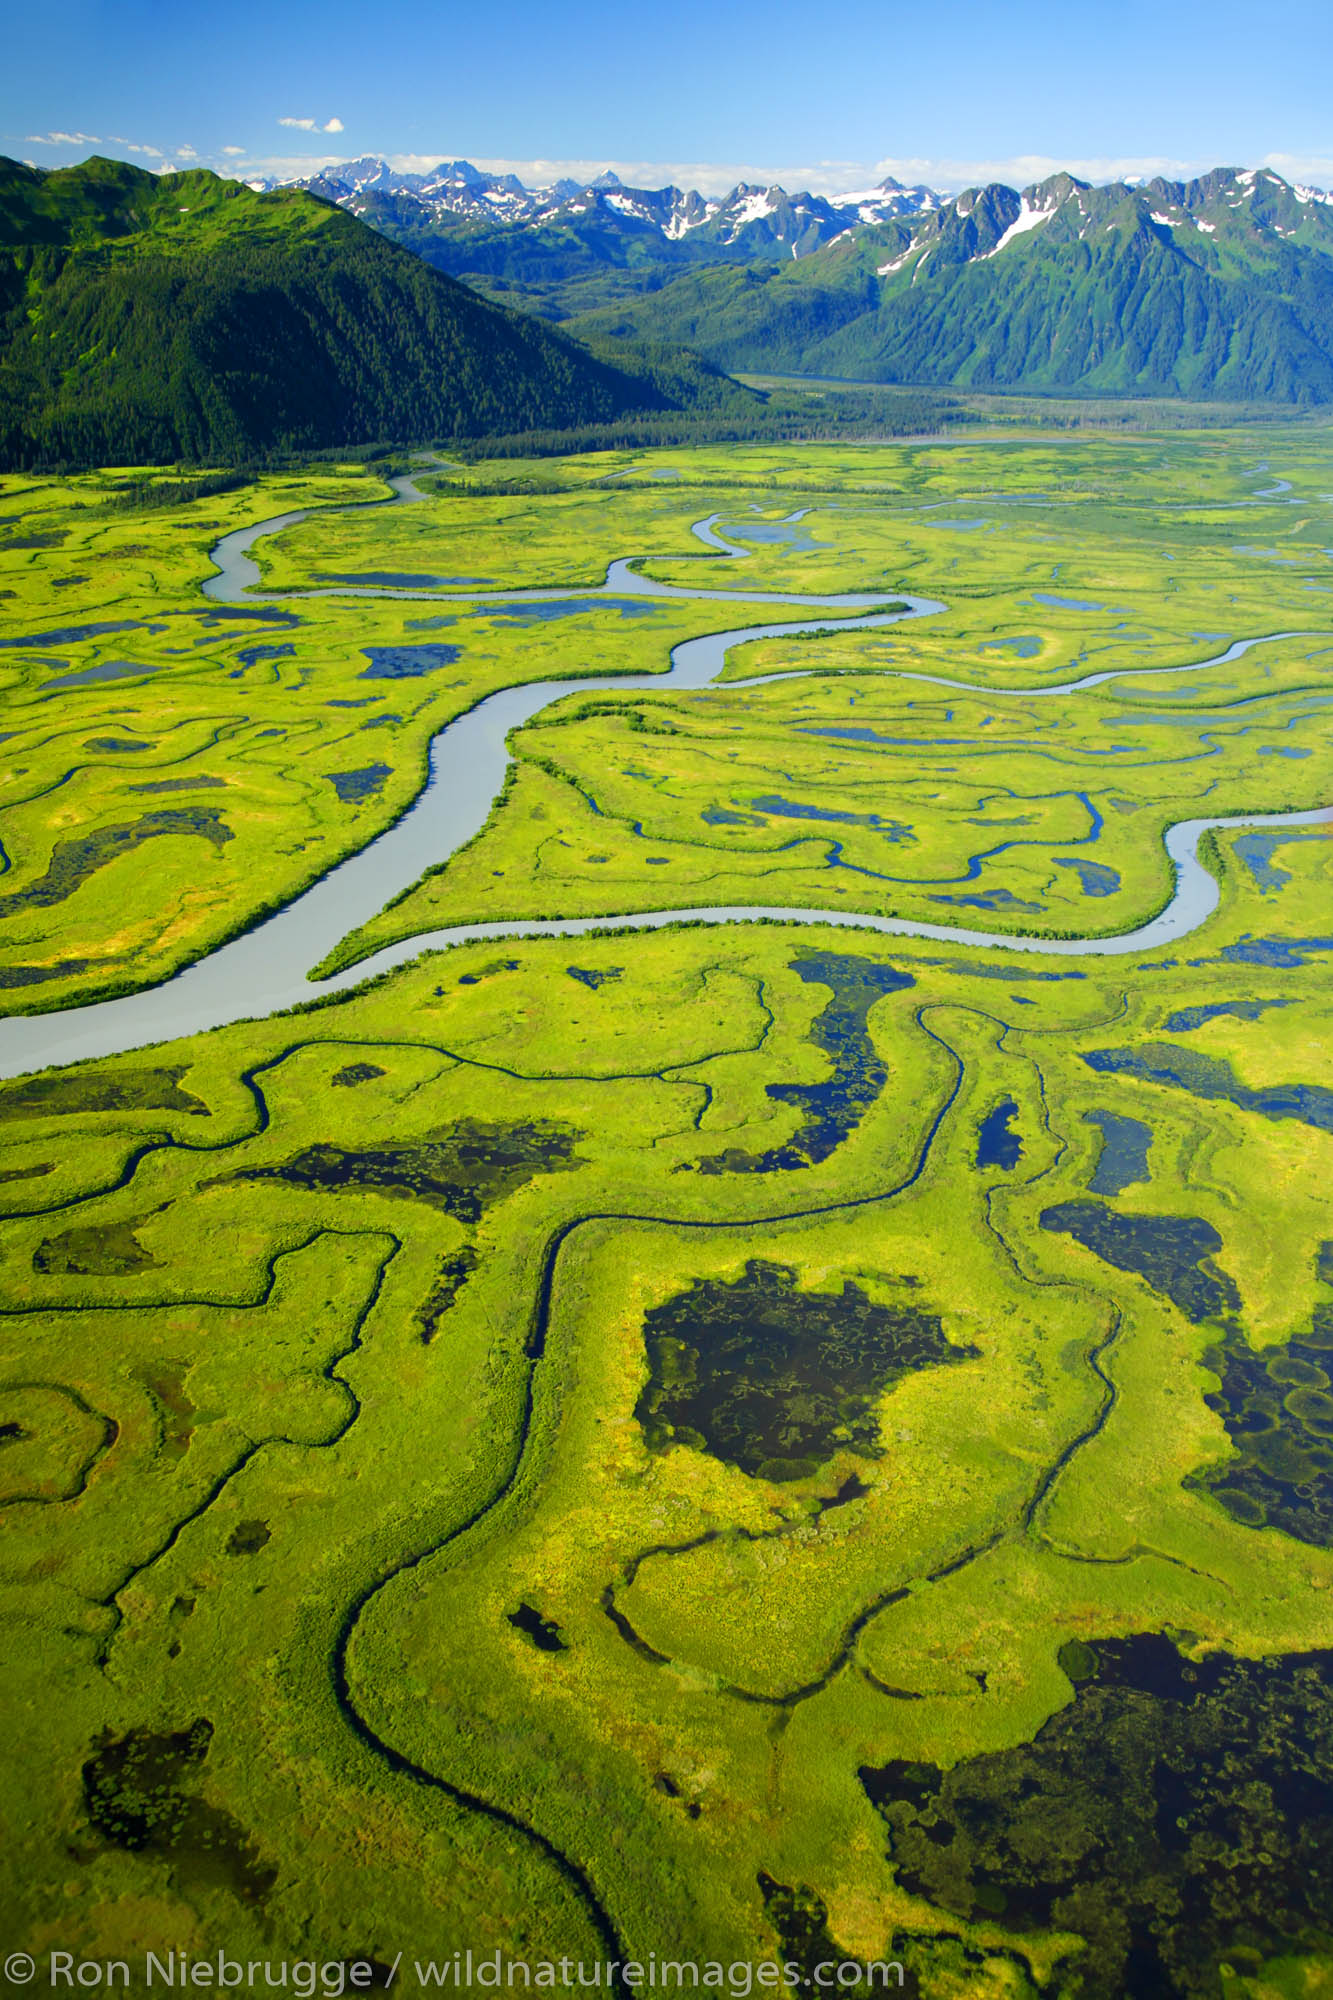 Chugach National Forest, Alaska Chugach, Copper River Delta, photo